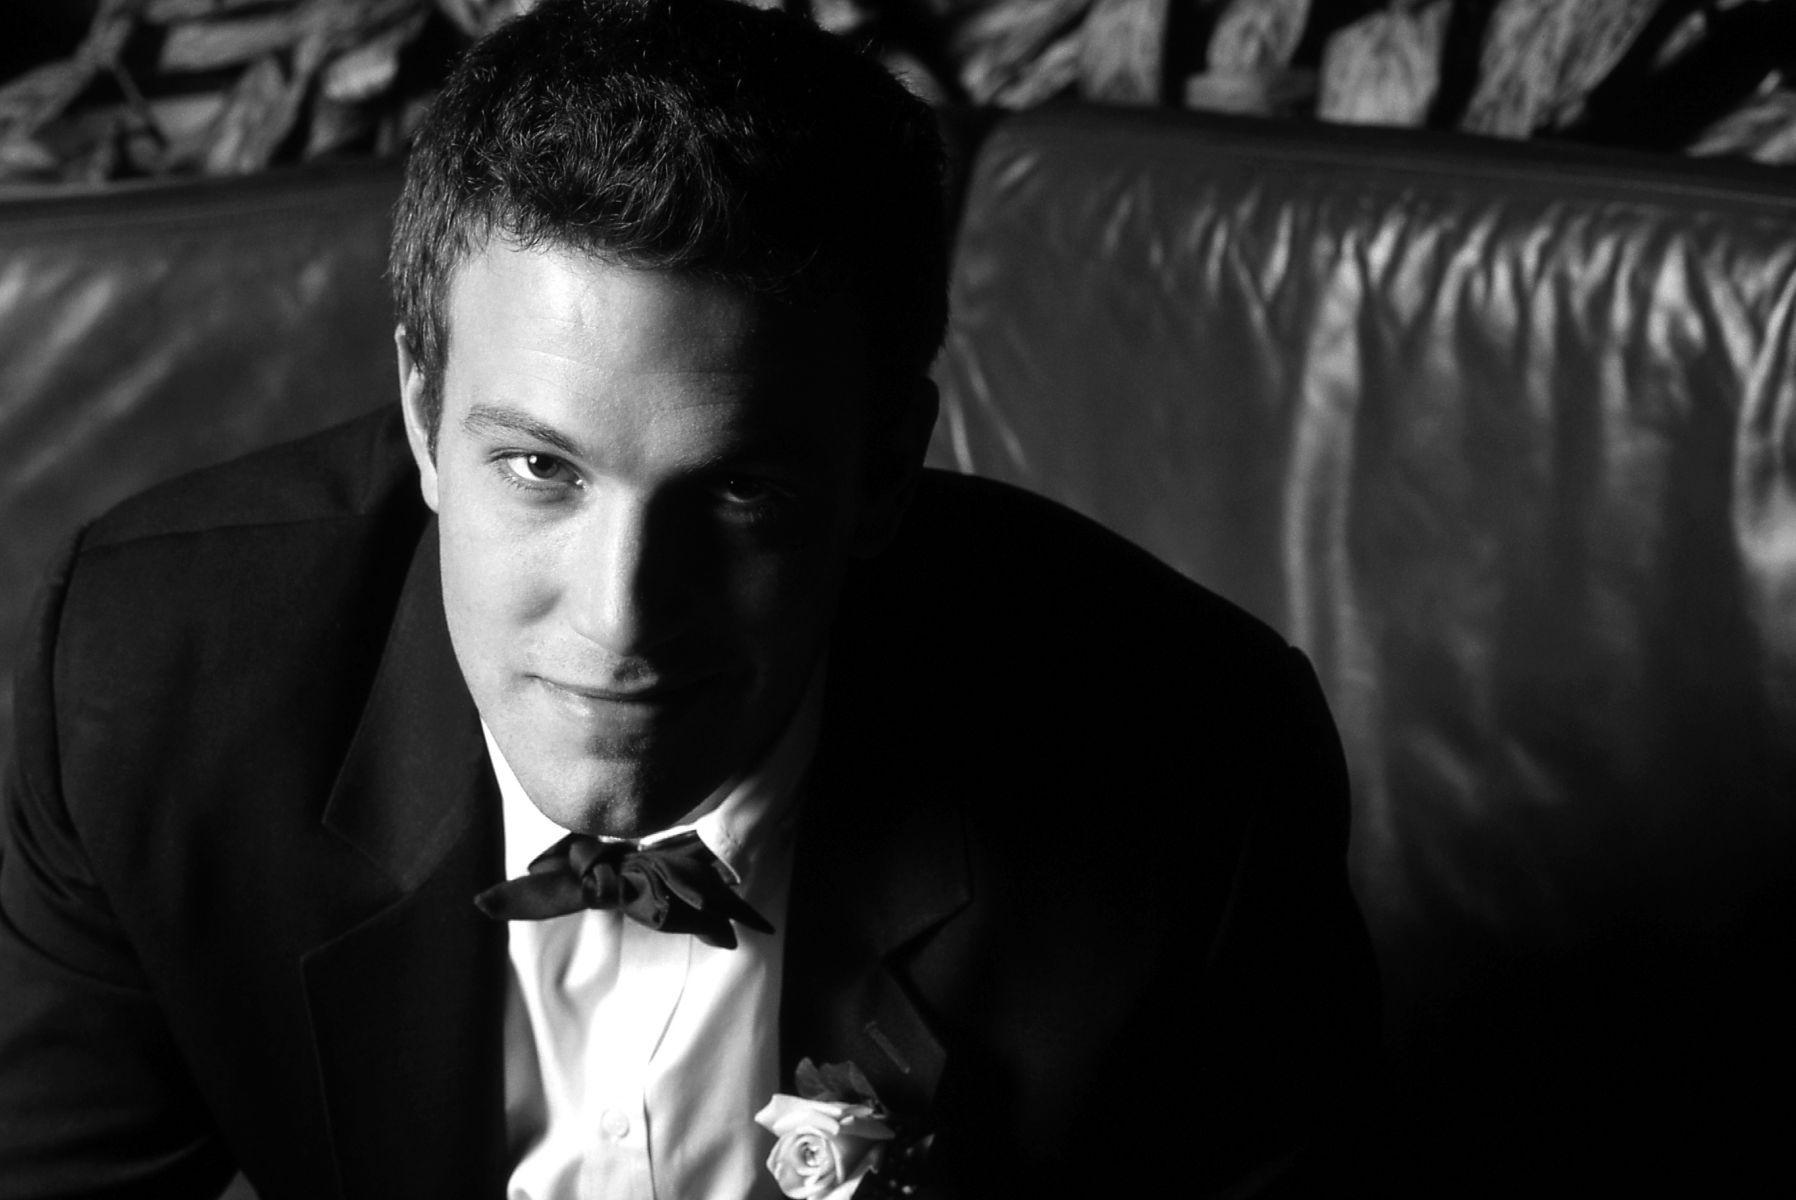 Ben Affleck, actor and director